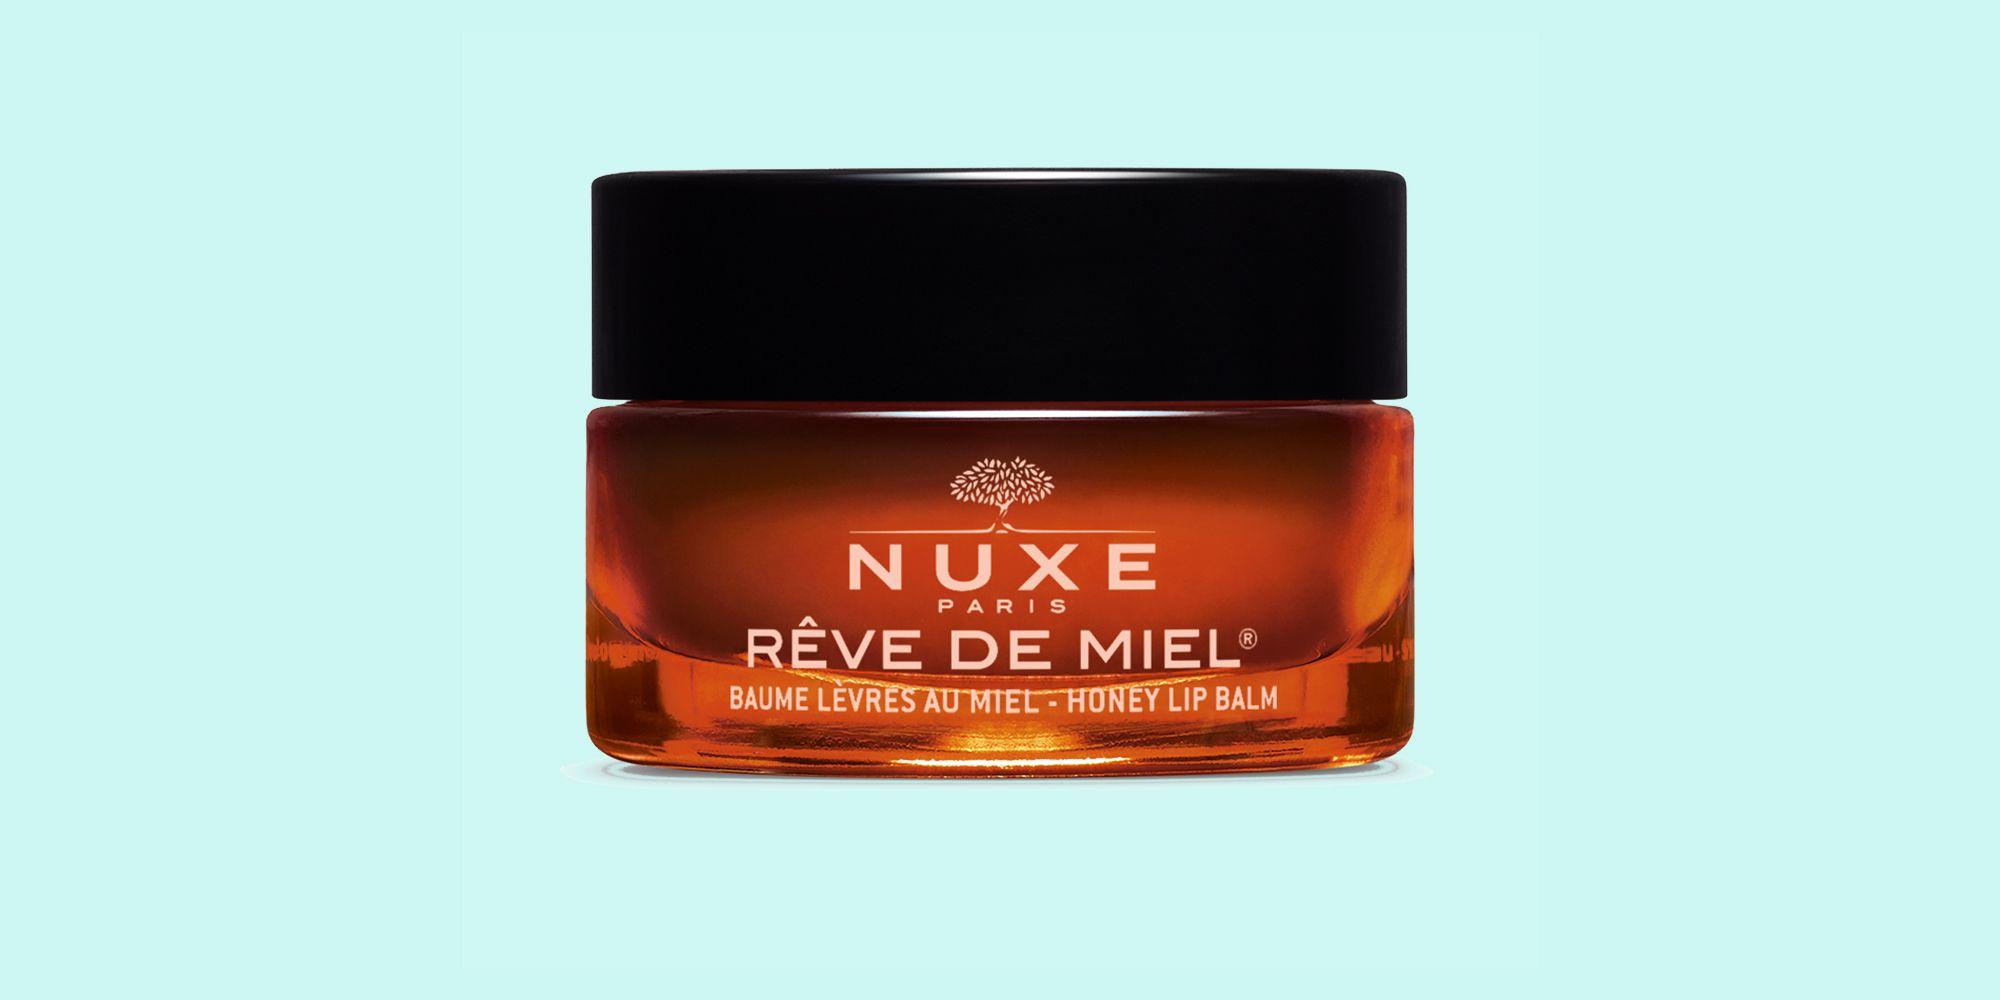 Nuxe Reve De Miel Lip Balm Review Is It Any Good? | Beauty